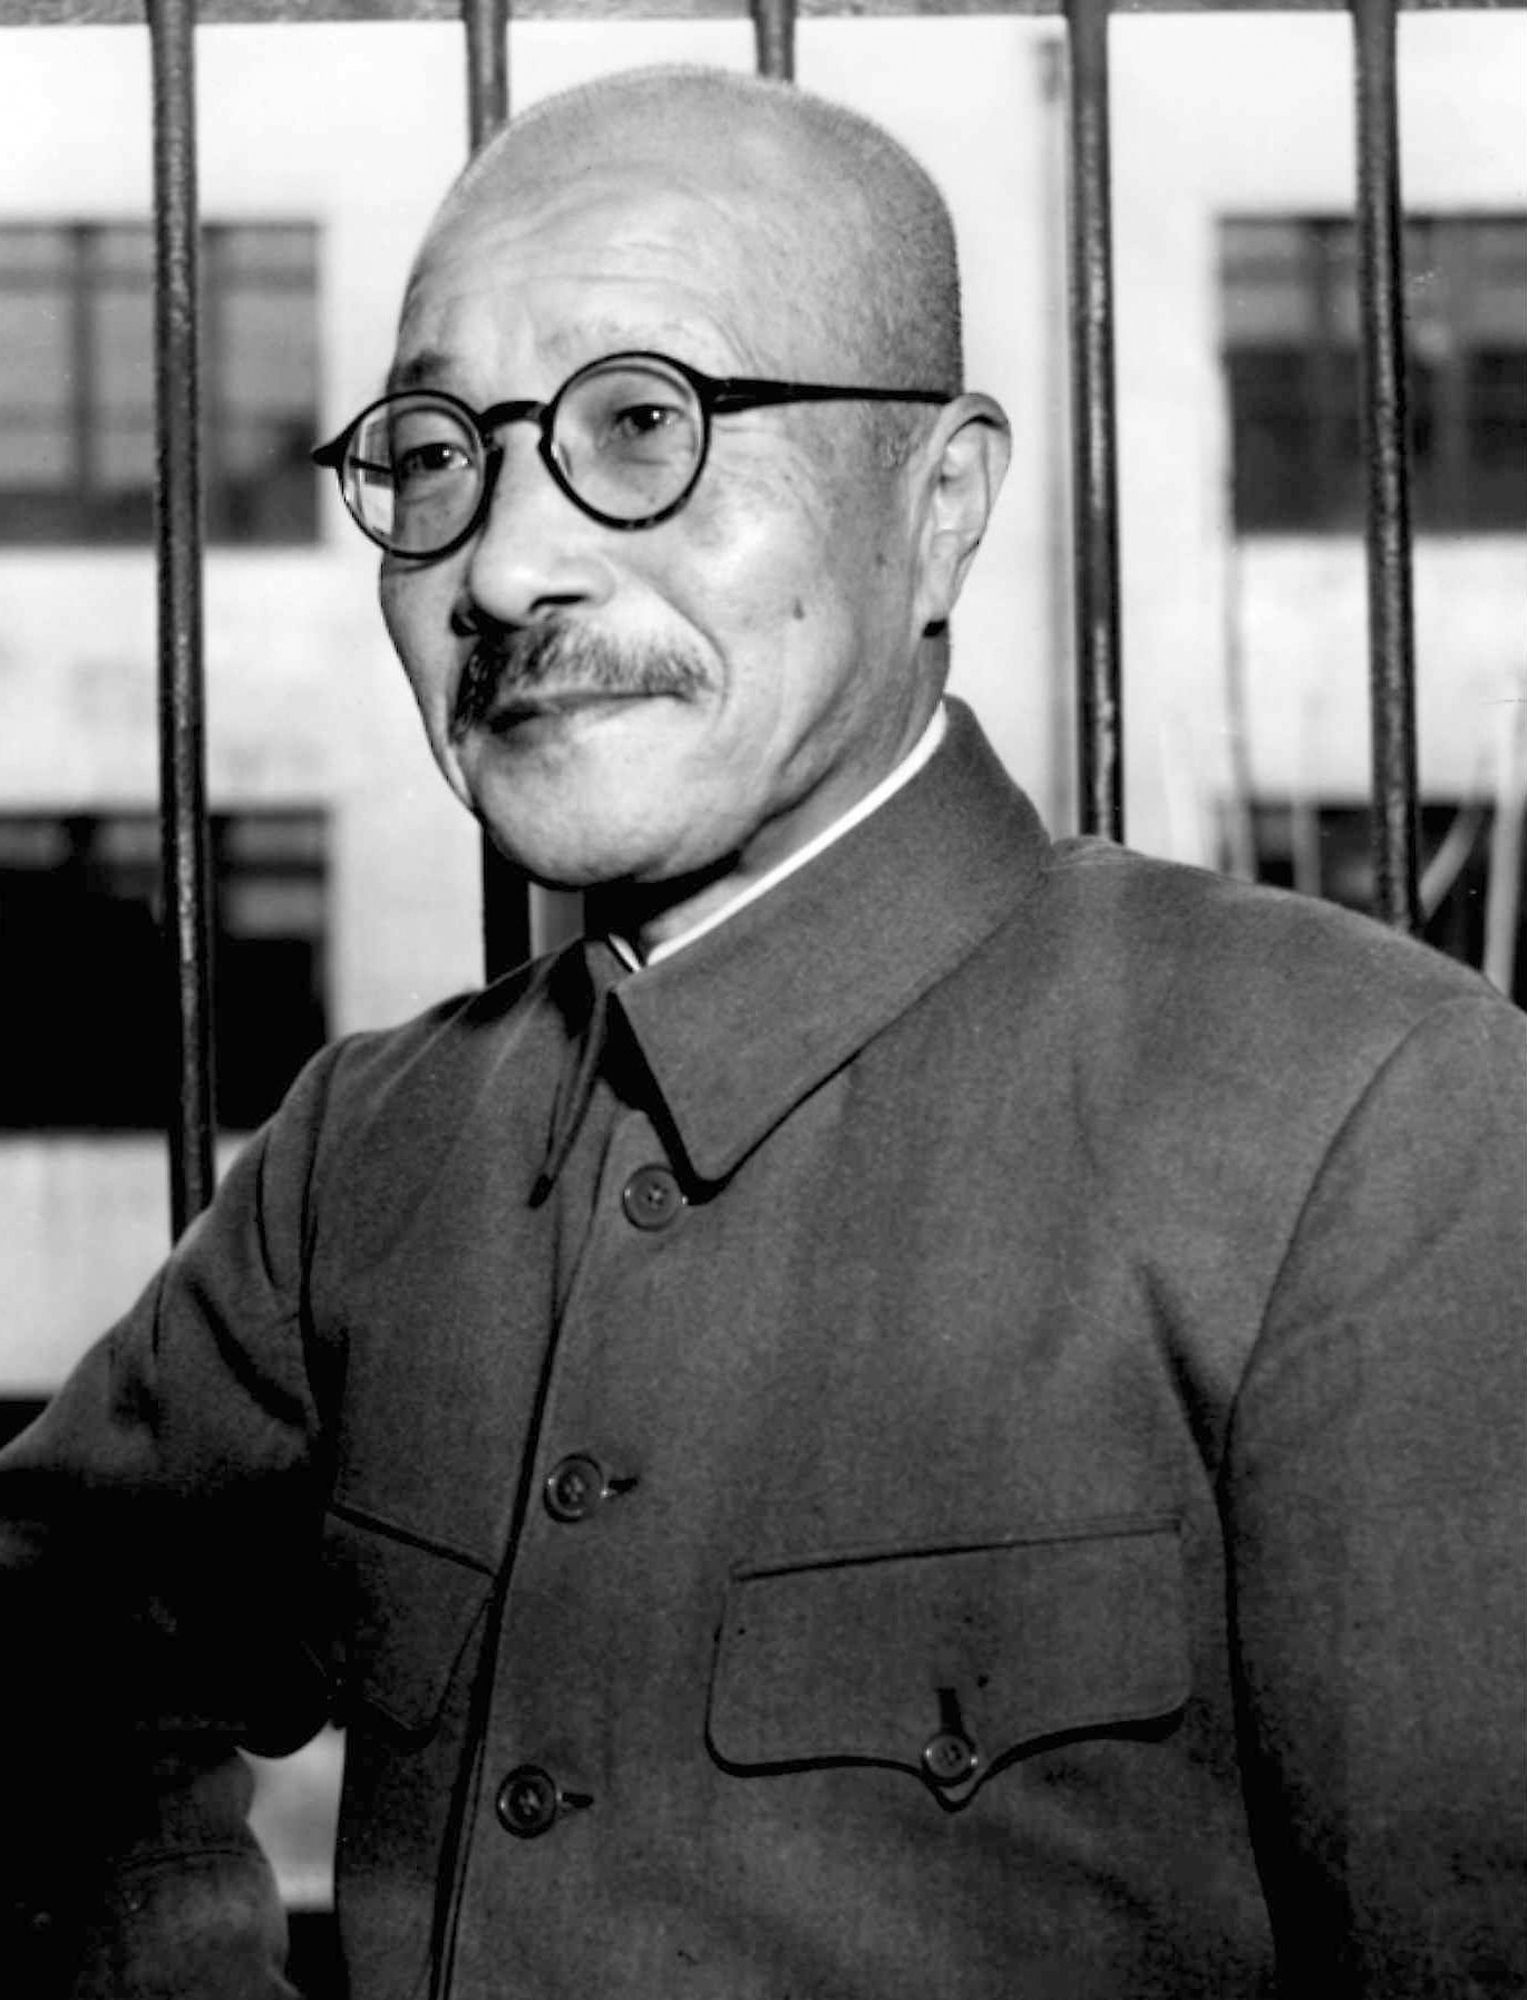 foto tomada en diciembre de 1947 al general hideki tojo primer ministro de jap n durante la. Black Bedroom Furniture Sets. Home Design Ideas